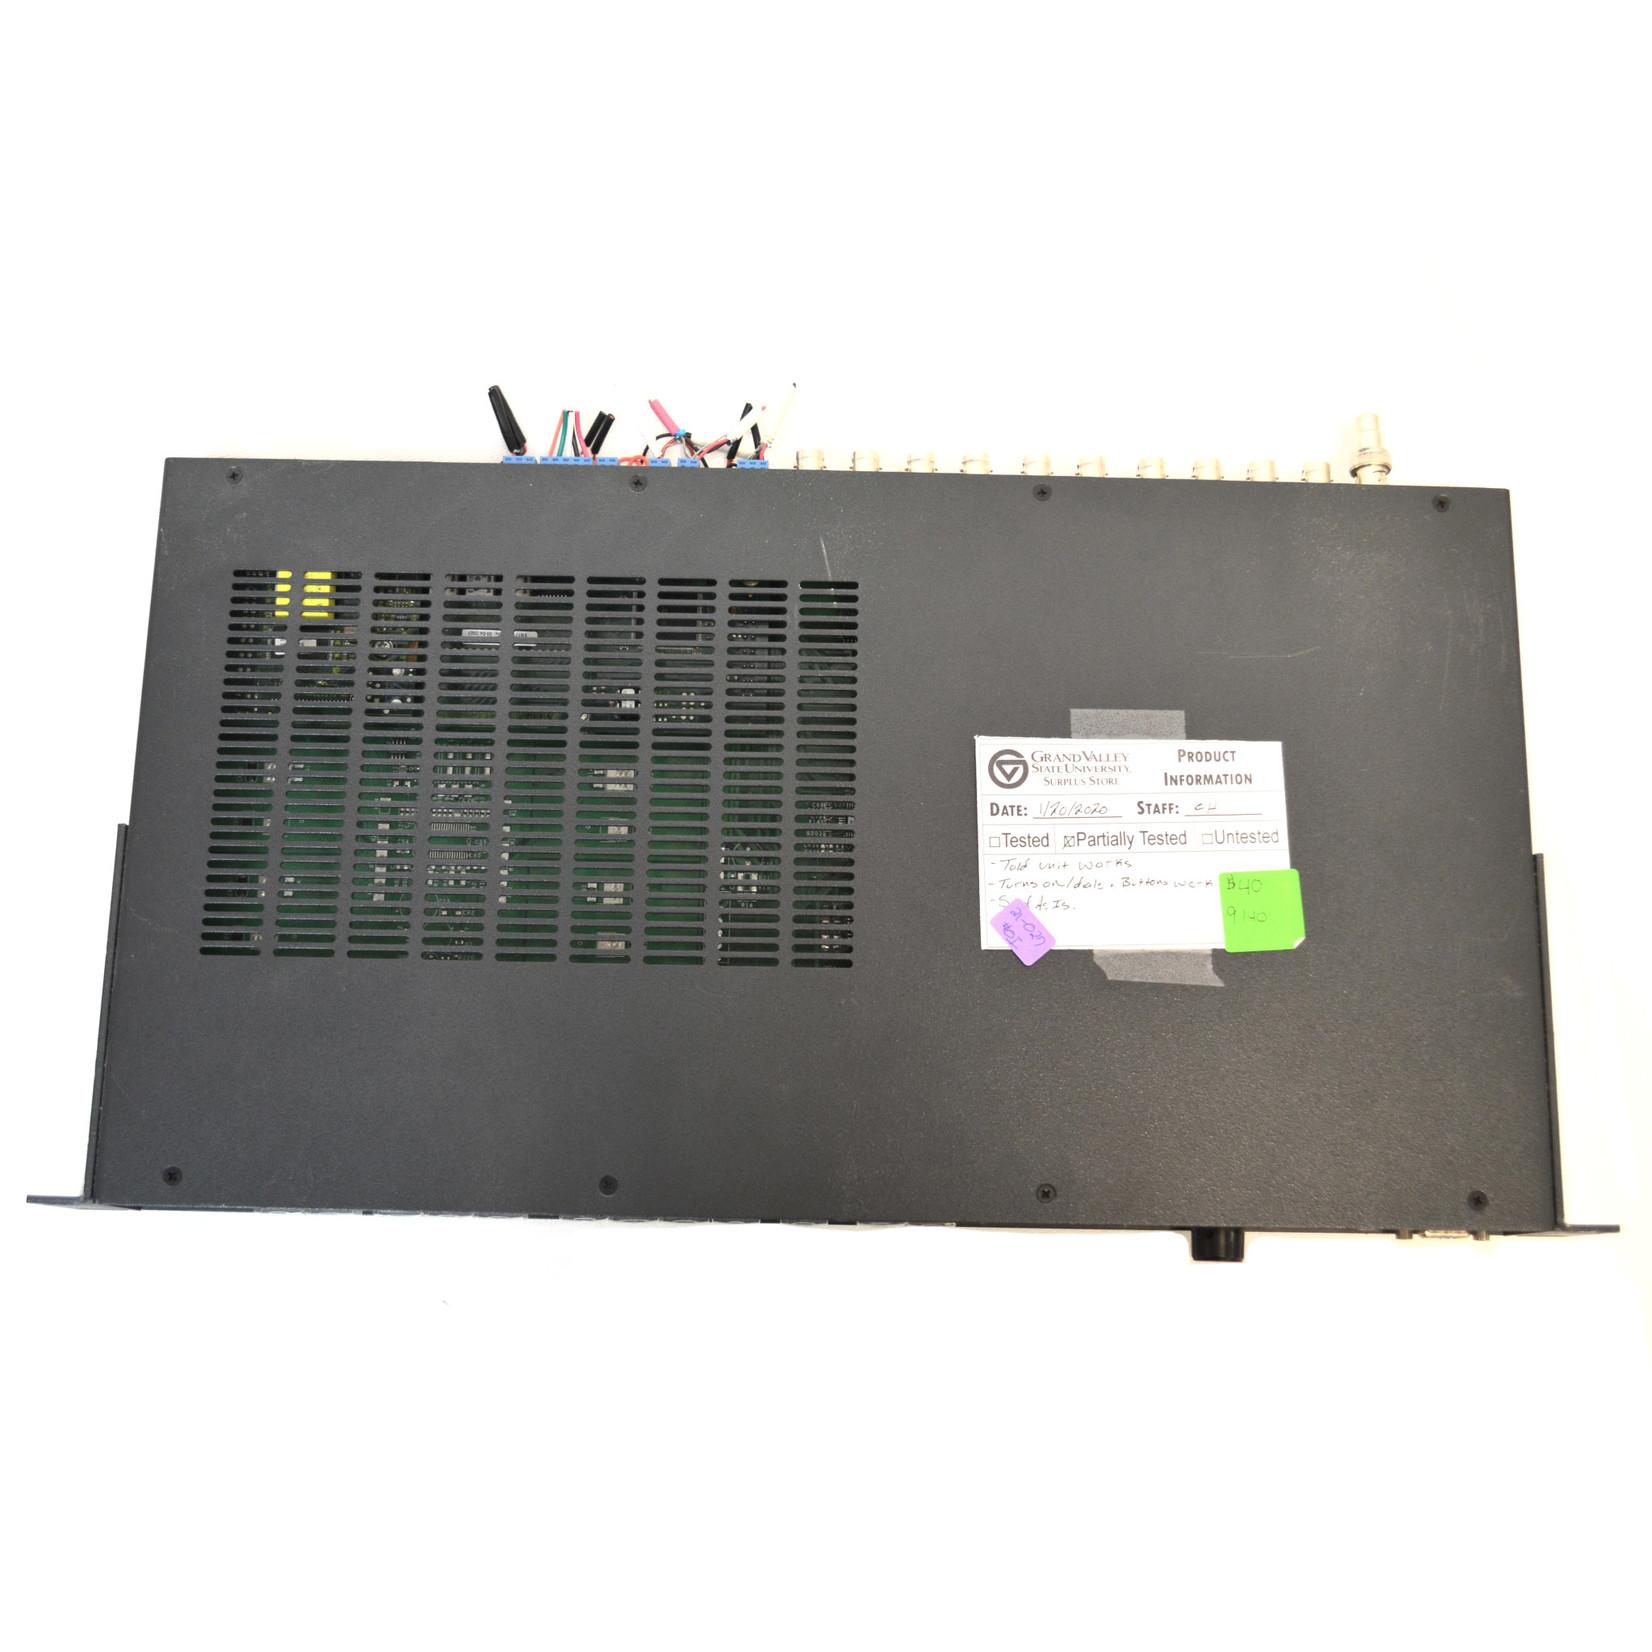 Extron System 5 IP Switcher